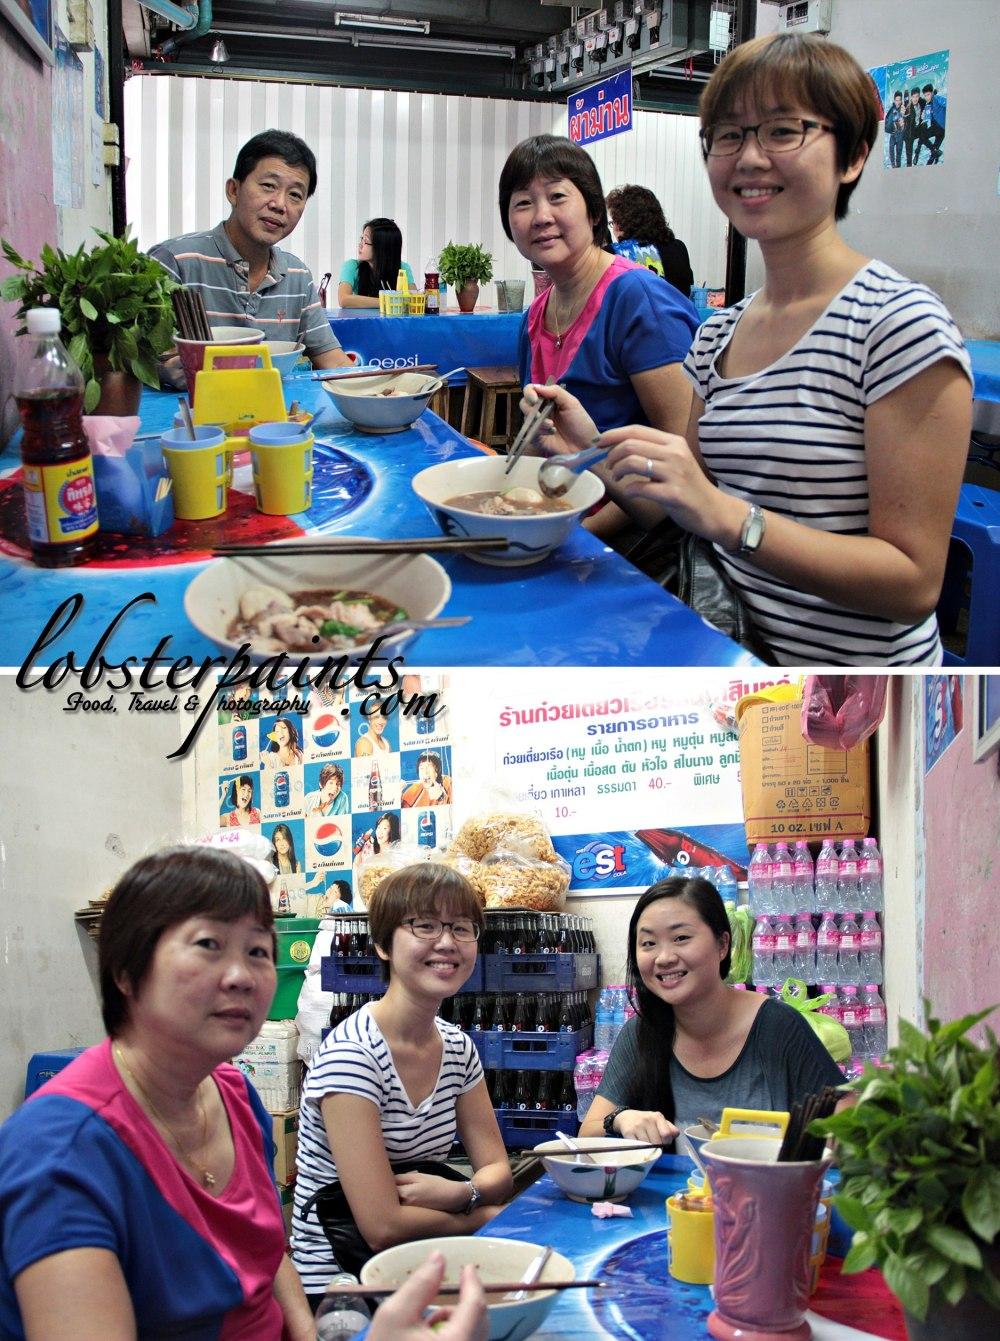 Boat Noodle @ Chatuchak Weekend Market | Bangkok, Thailand